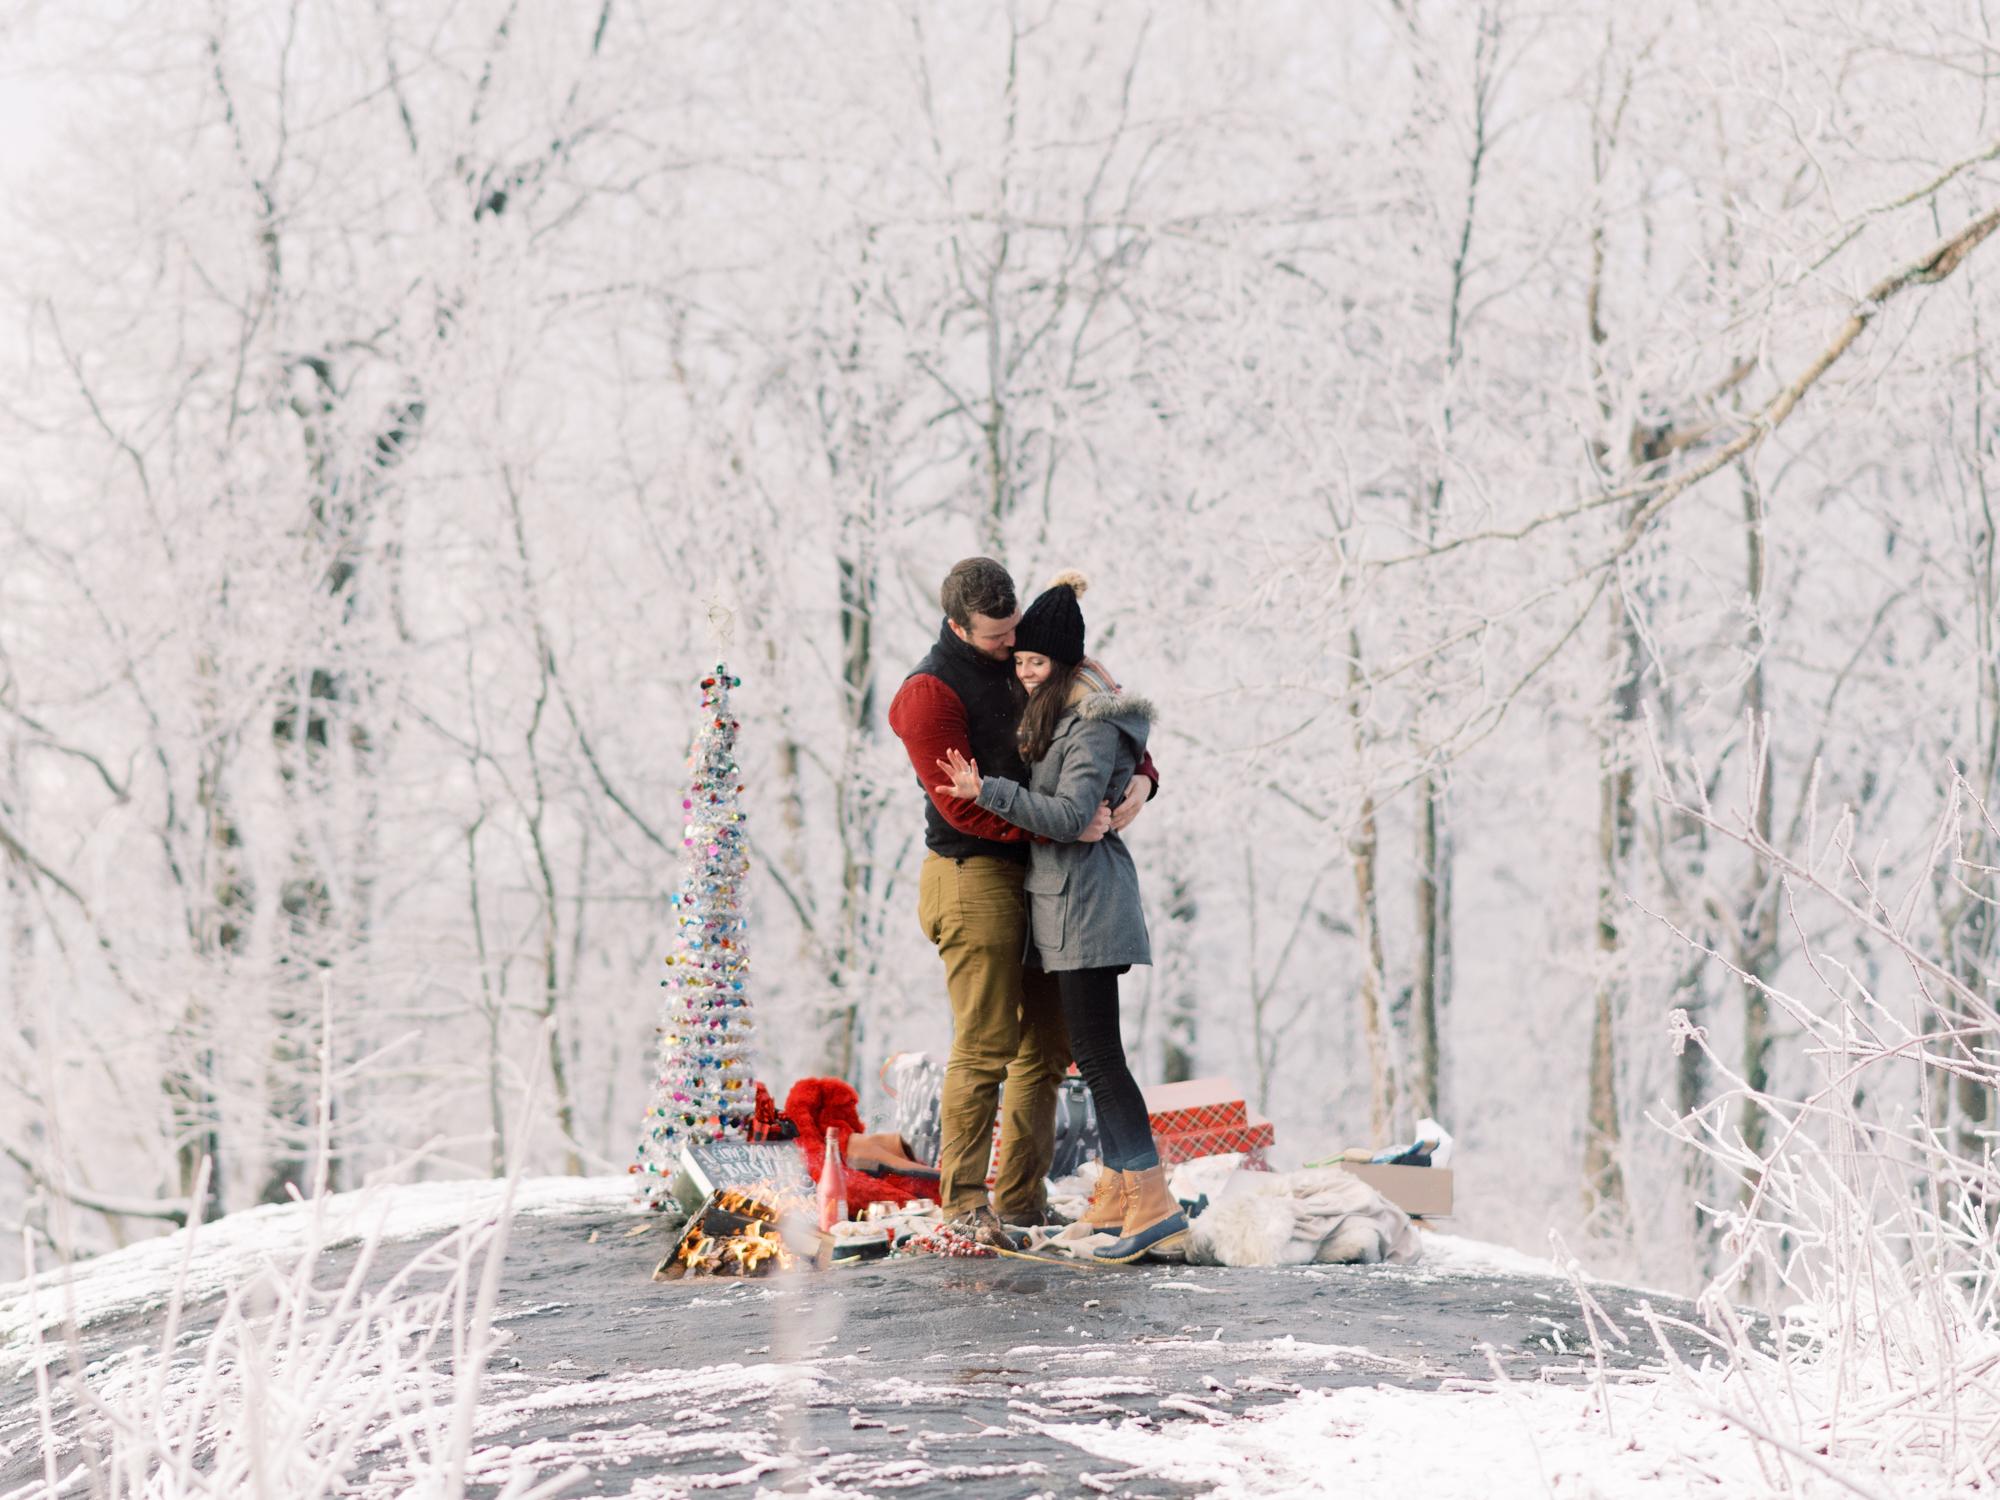 snowy-georgia-proposal-preachers-rock-atlanta-dahlonega-wedding-photographer-hannah-forsberg-fine-art-film-13.jpg